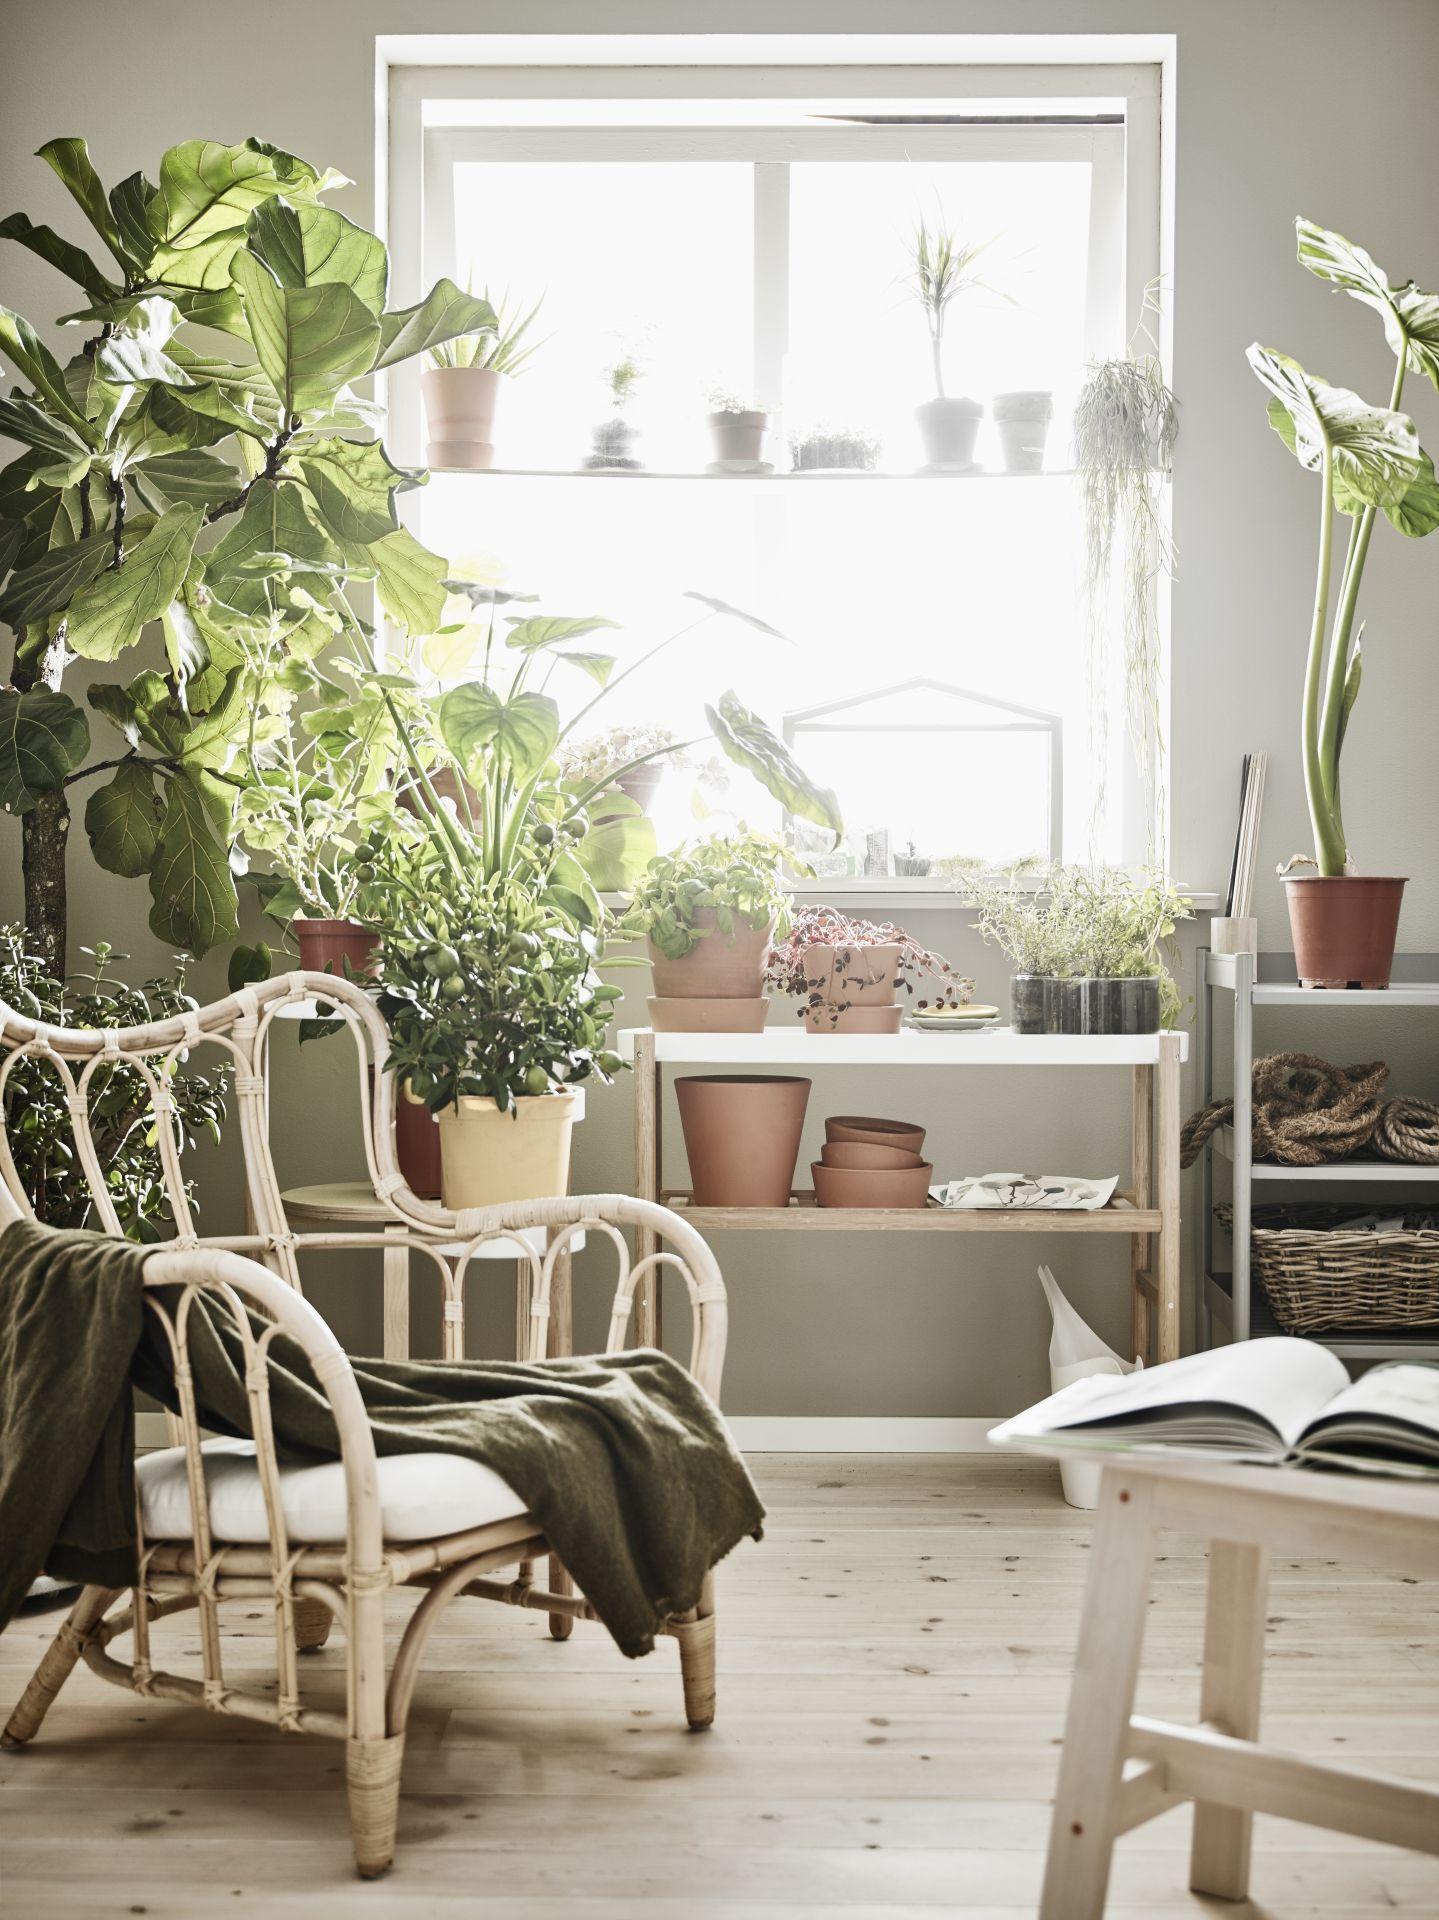 MASTHOLMEN Fauteuil, buiten | Ikea design, Interiors and Catalog